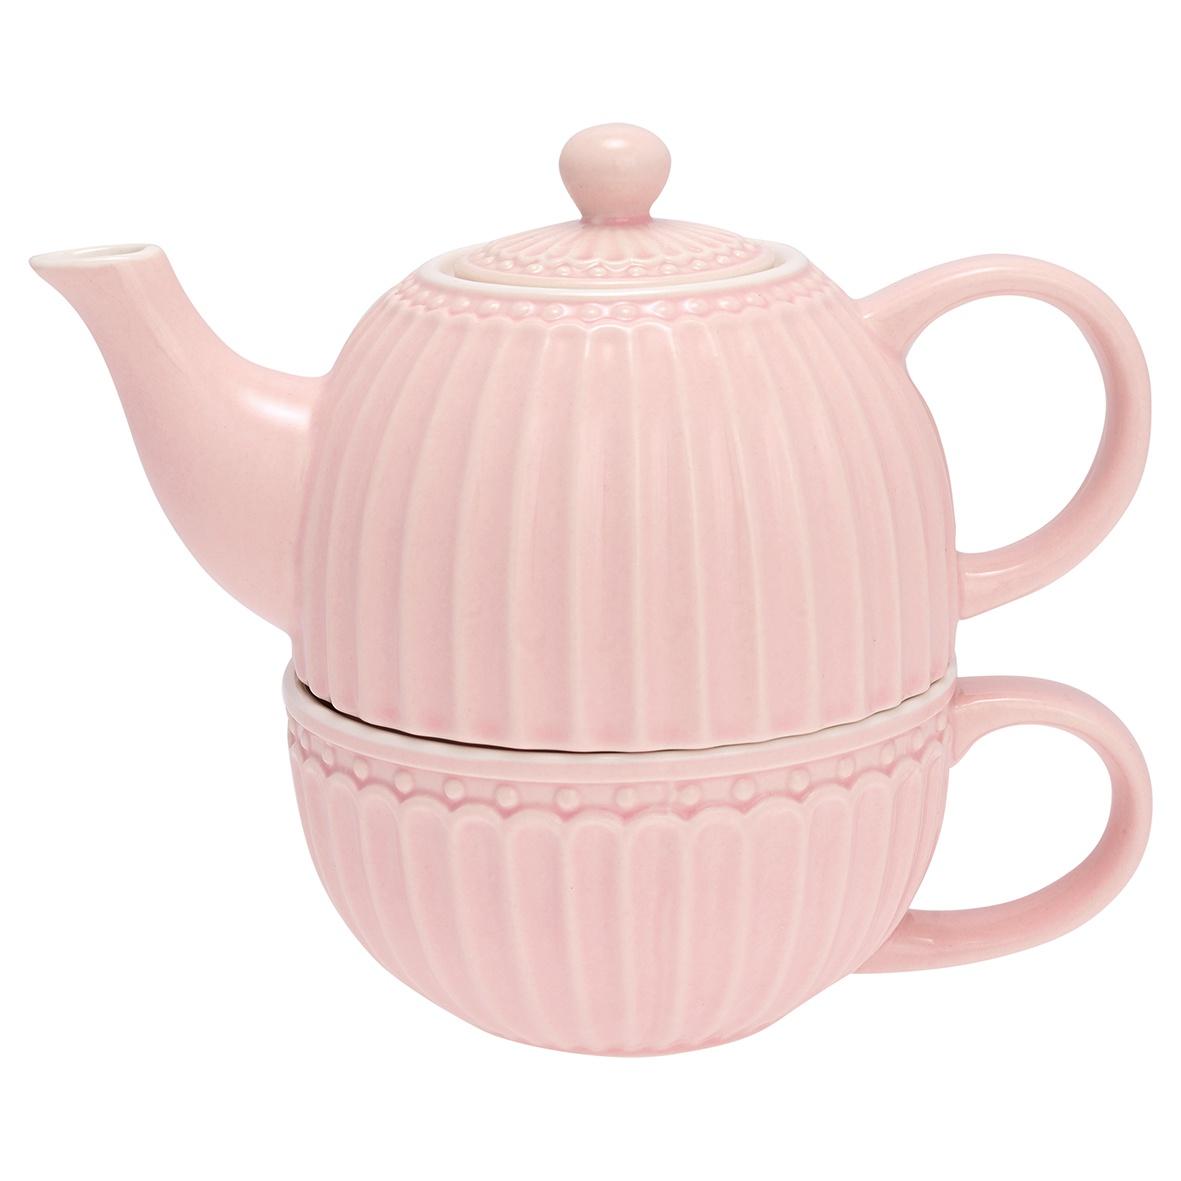 Чайник с чашкой Greengate Alice pale pink